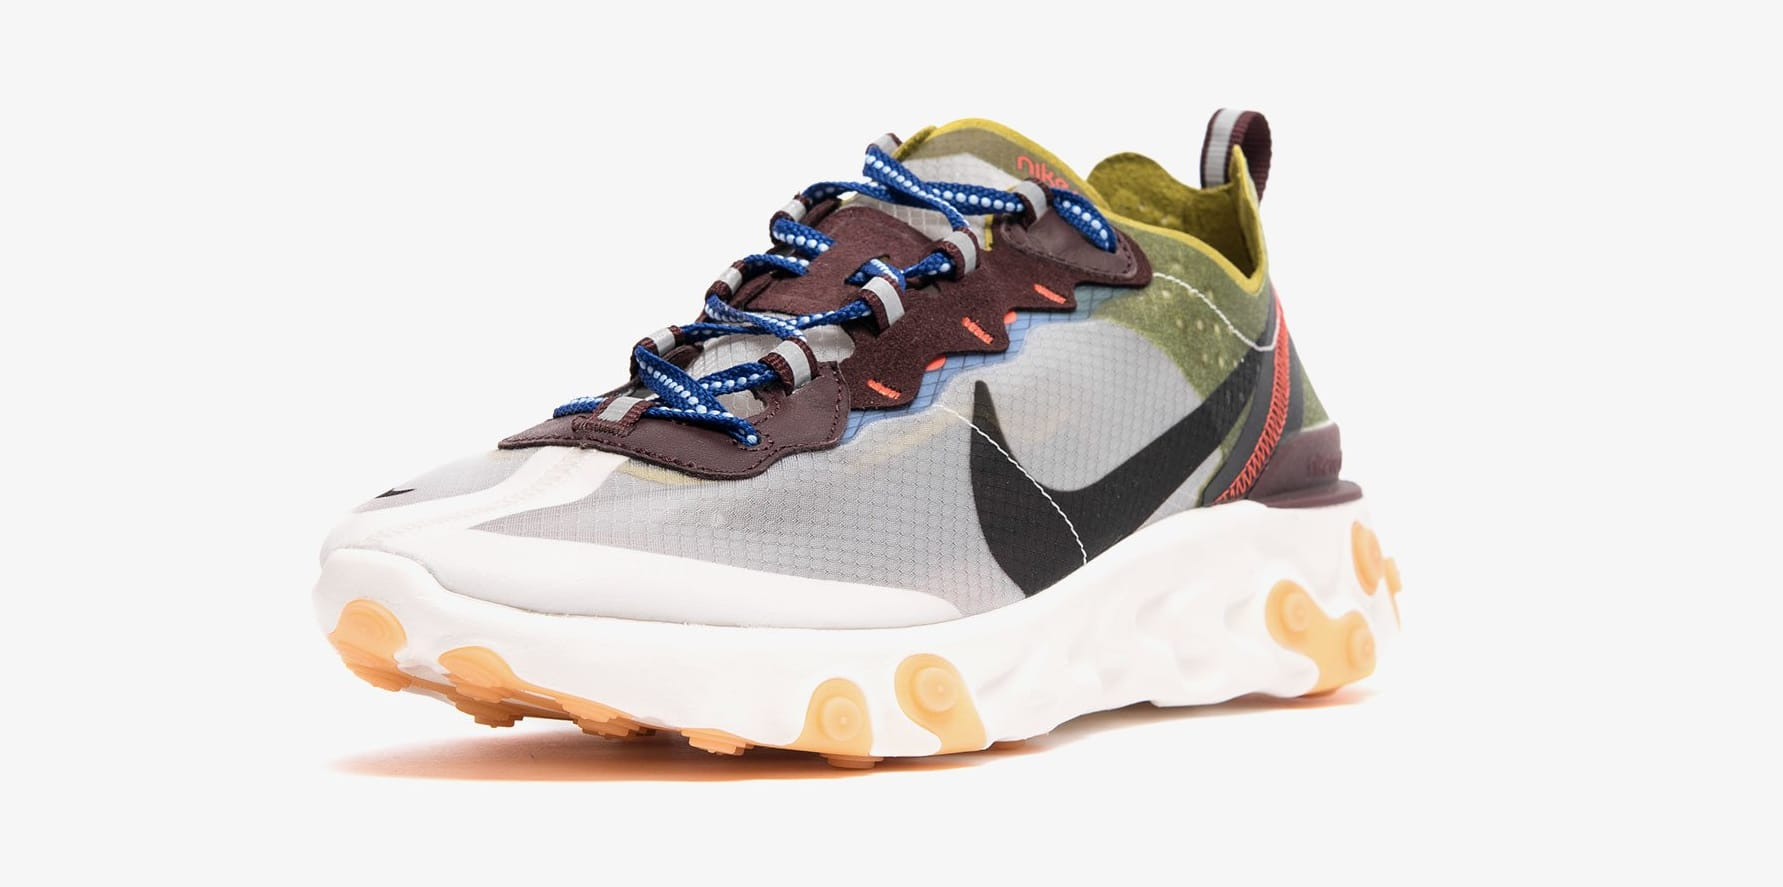 Nike React Element 87 AQ1090-300 (Toe)